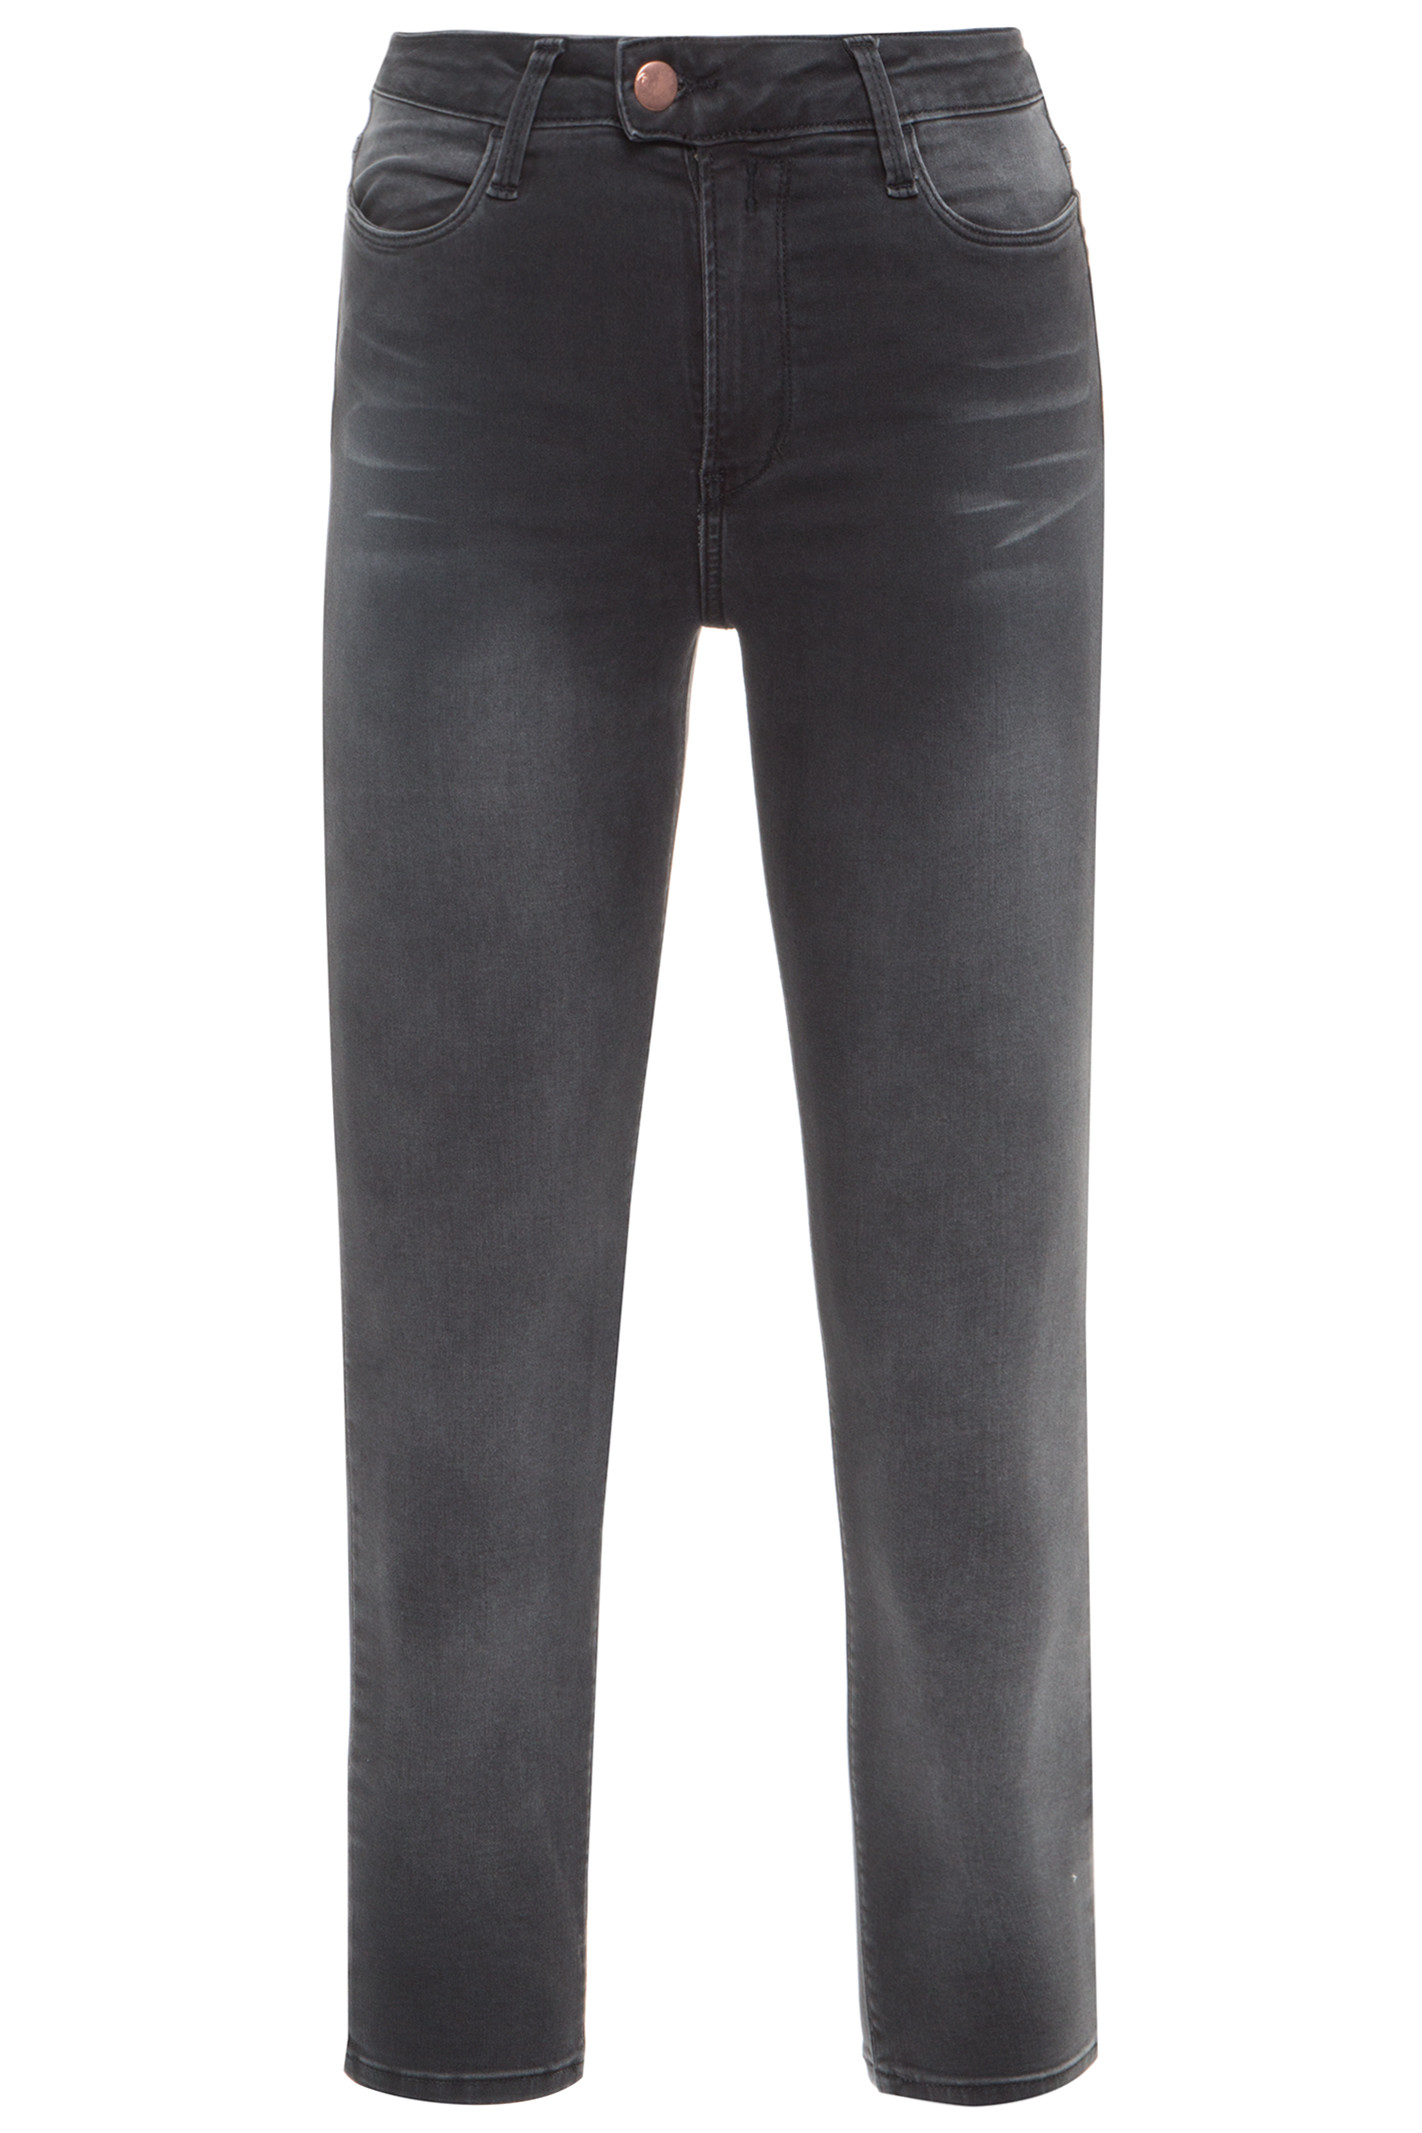 Calça Jeans Highwaist Cropped - Cinza